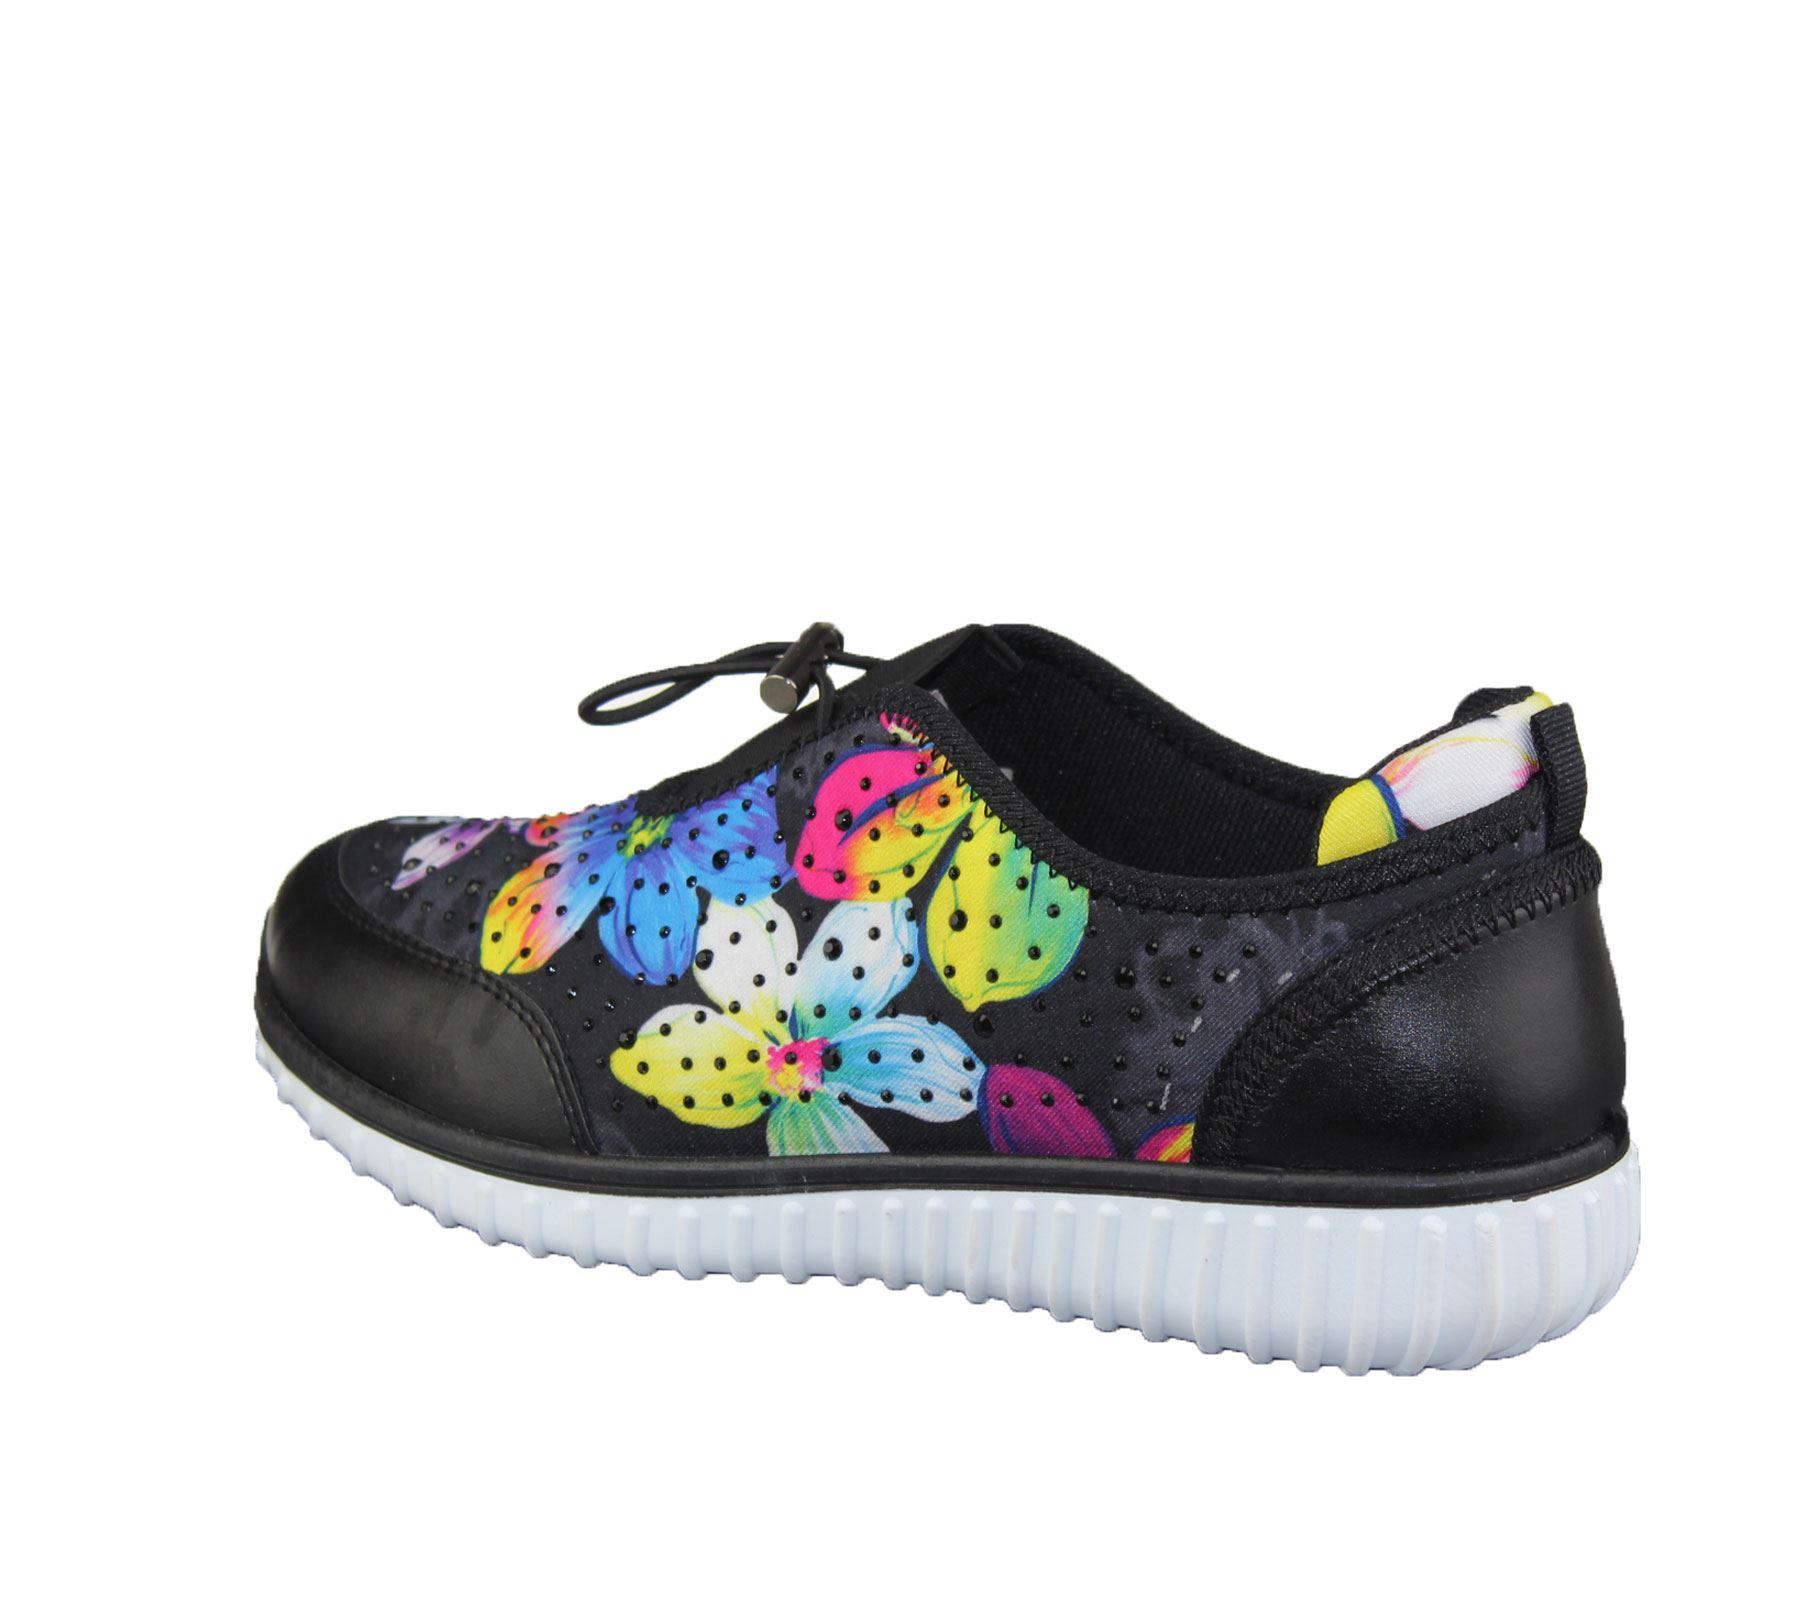 Womens-Trainer-Ladies-Comfort-Walking-Fashion-Summer-Gym-Sport-Flat-Shoes-Size thumbnail 4